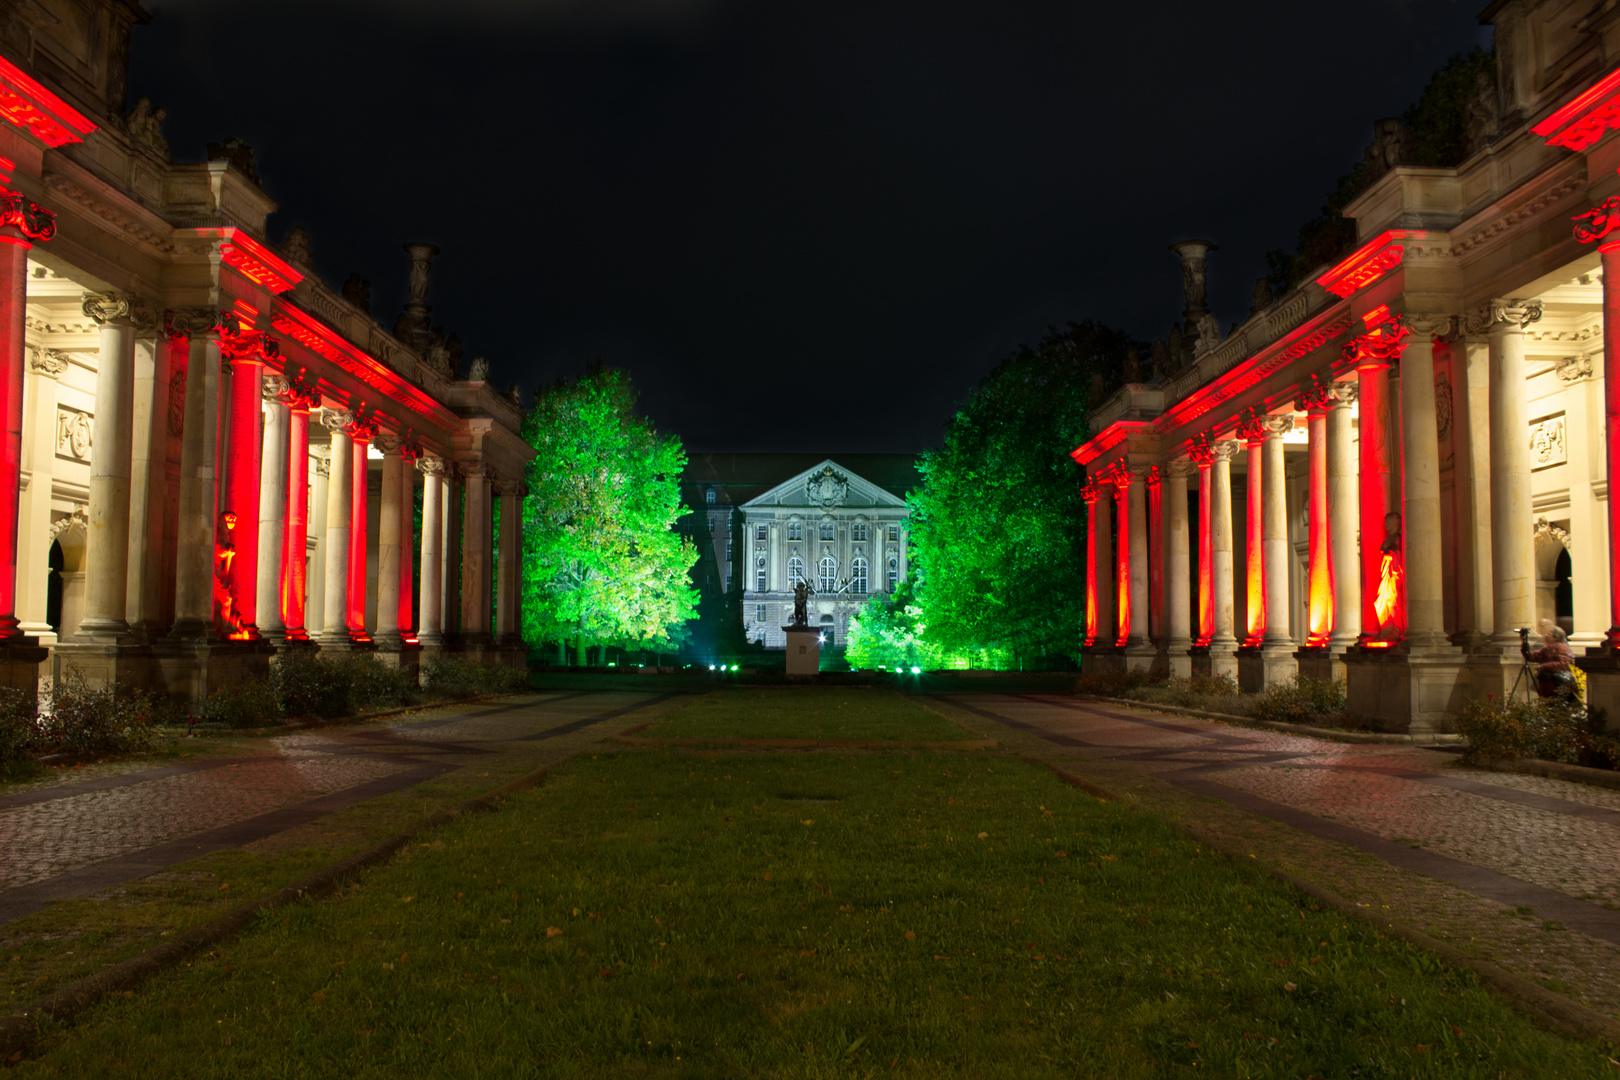 Festival of Lights: Kammergericht, Schöneberg